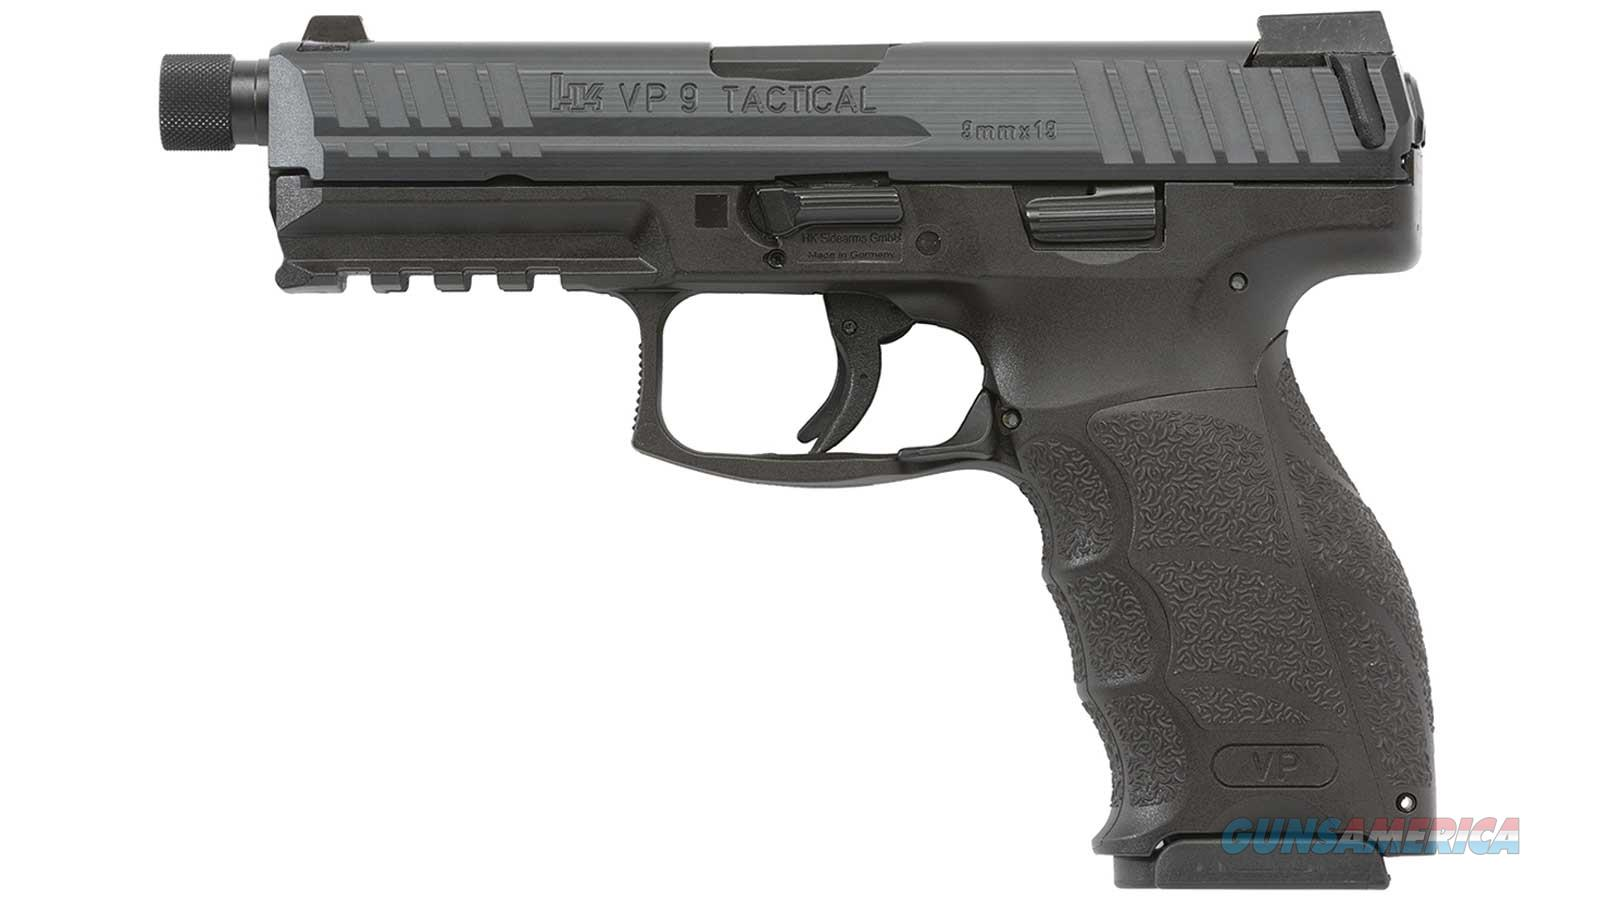 "Heckler & Koch Vp9 Tactical 9Mm Threaded 4.70"" Front Ns Only 3-10Rd Blk 700009TLEL-A5  Guns > Pistols > H Misc Pistols"